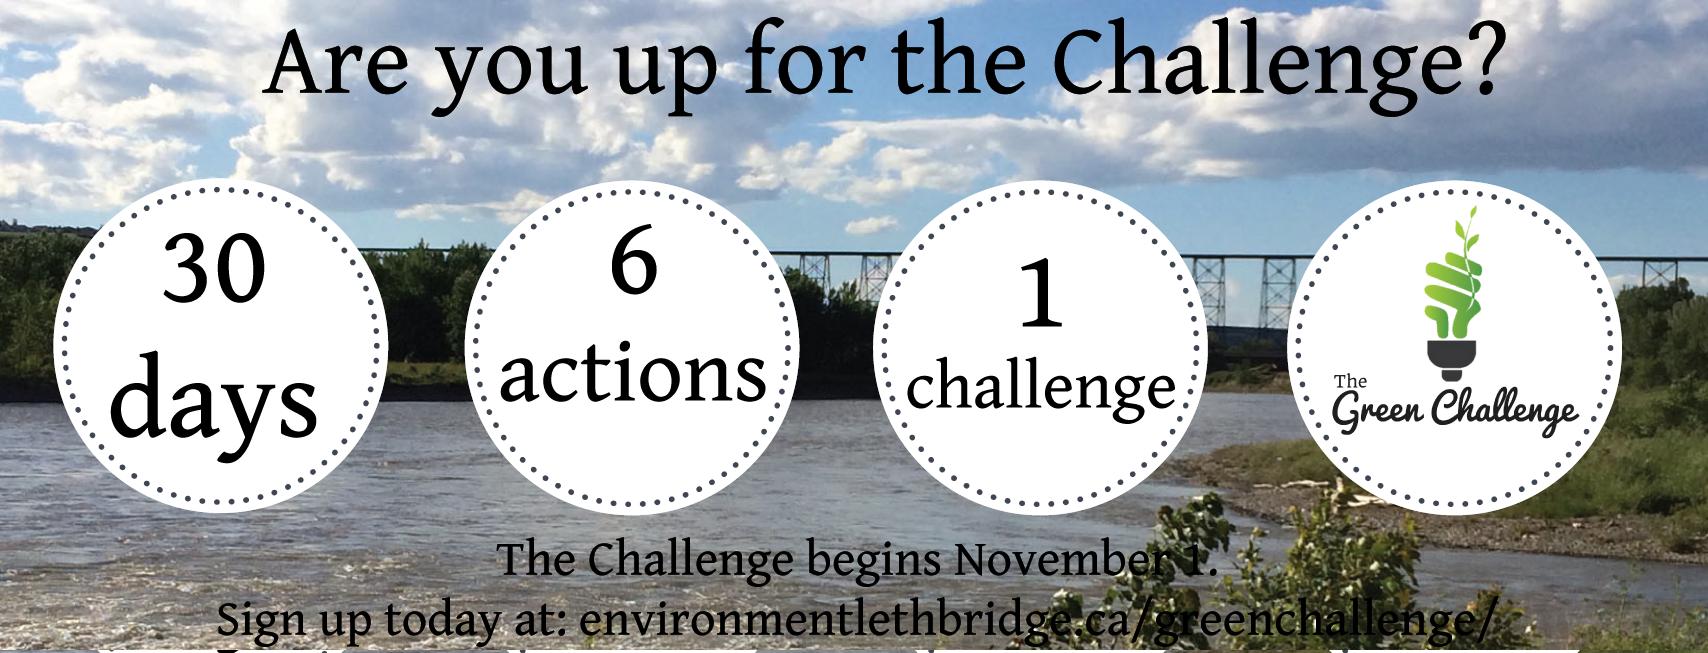 green-challenge-2018-web-banner